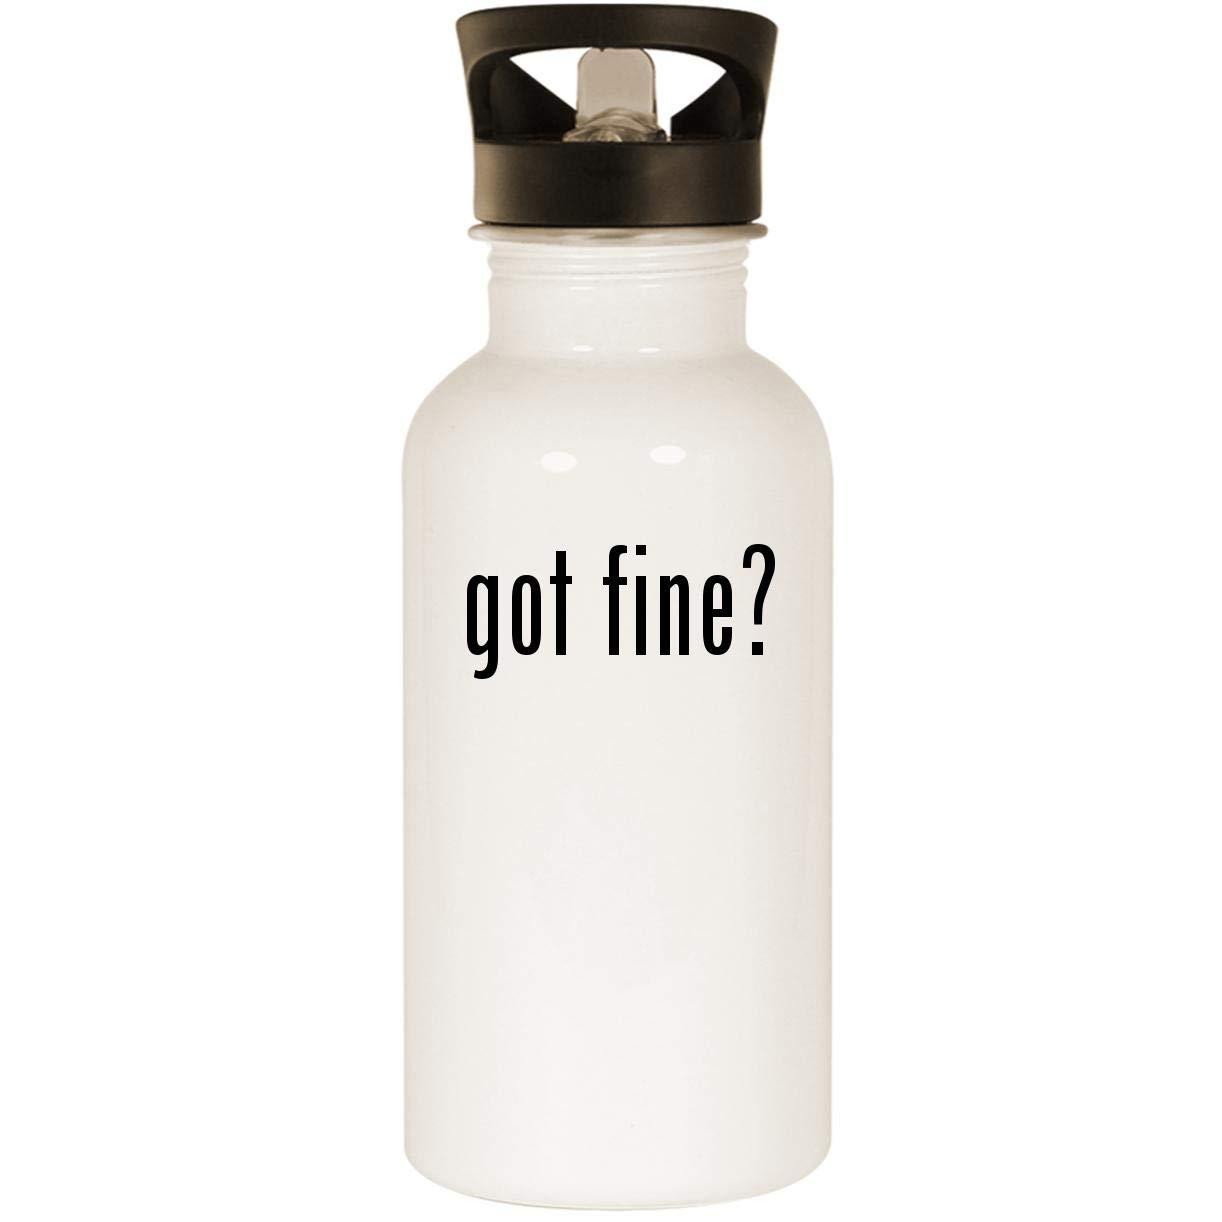 got fine? - Stainless Steel 20oz Road Ready Water Bottle, White